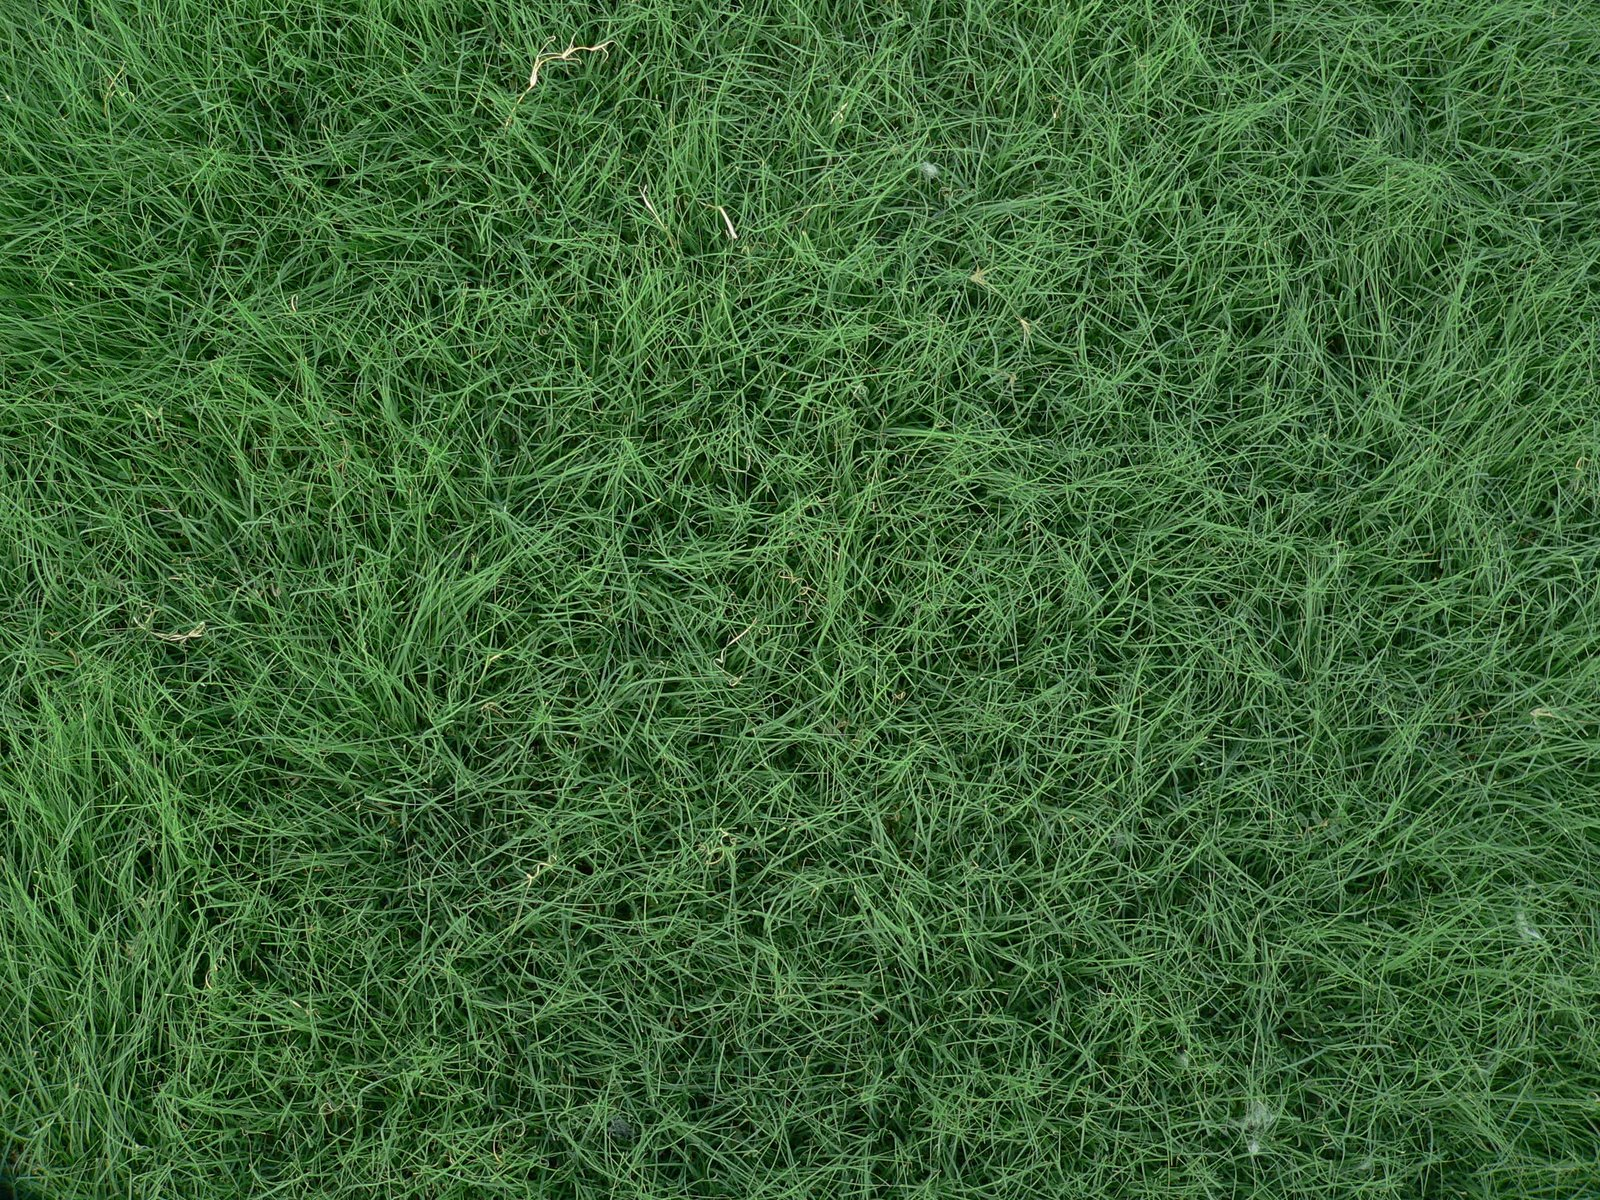 Garden Of Aaron Buffalo Grass Won T You Come Out Tonight